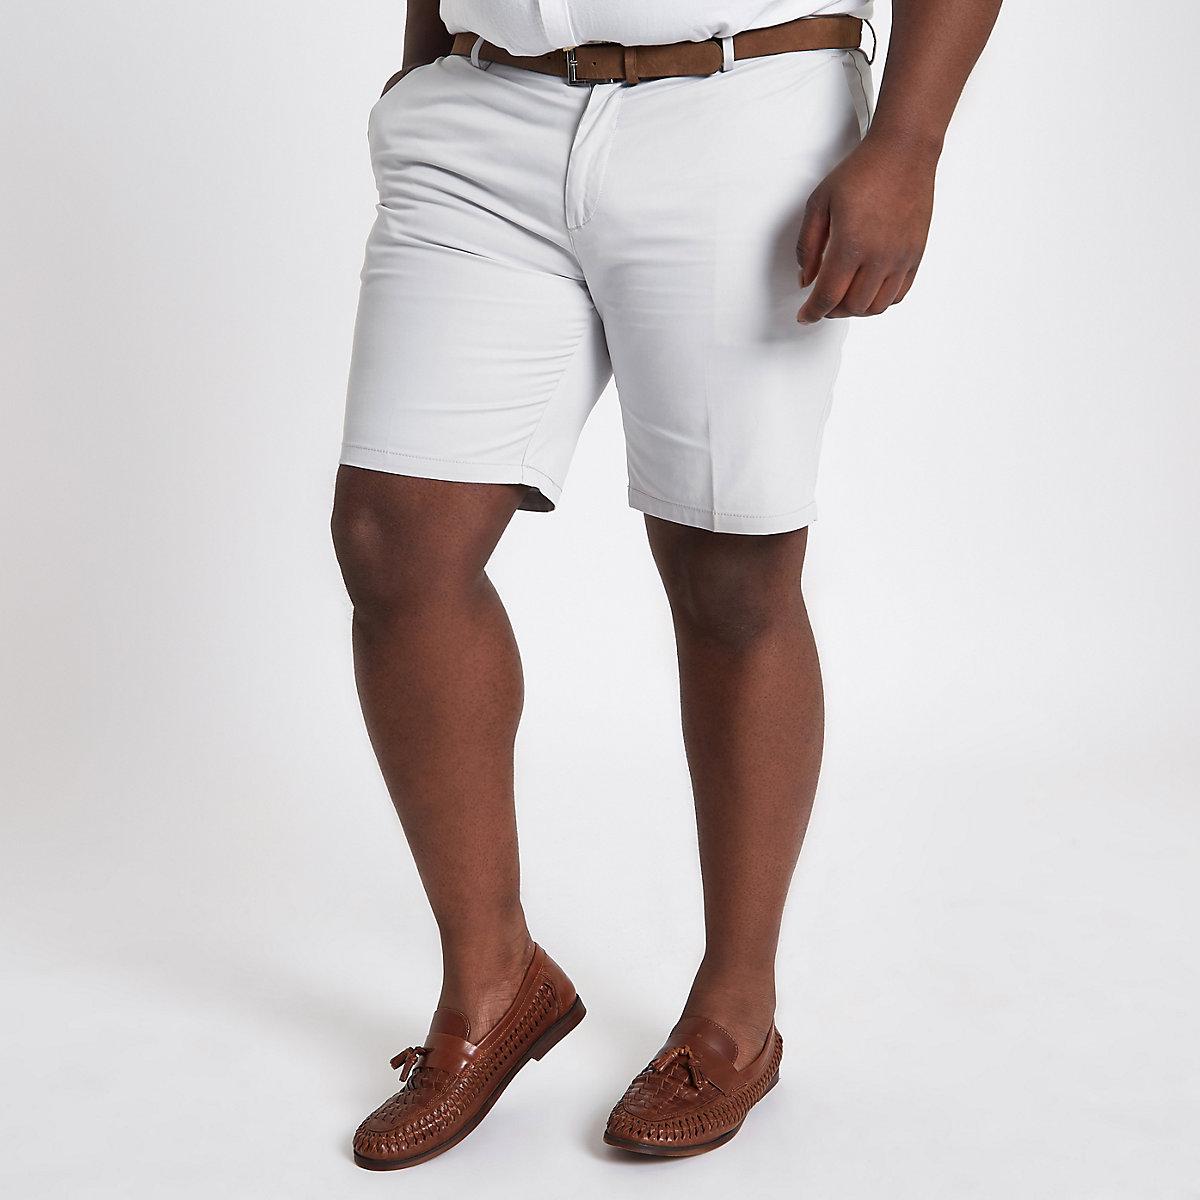 Big and Tall – Steingraue Chino-Shorts mit Gürtel